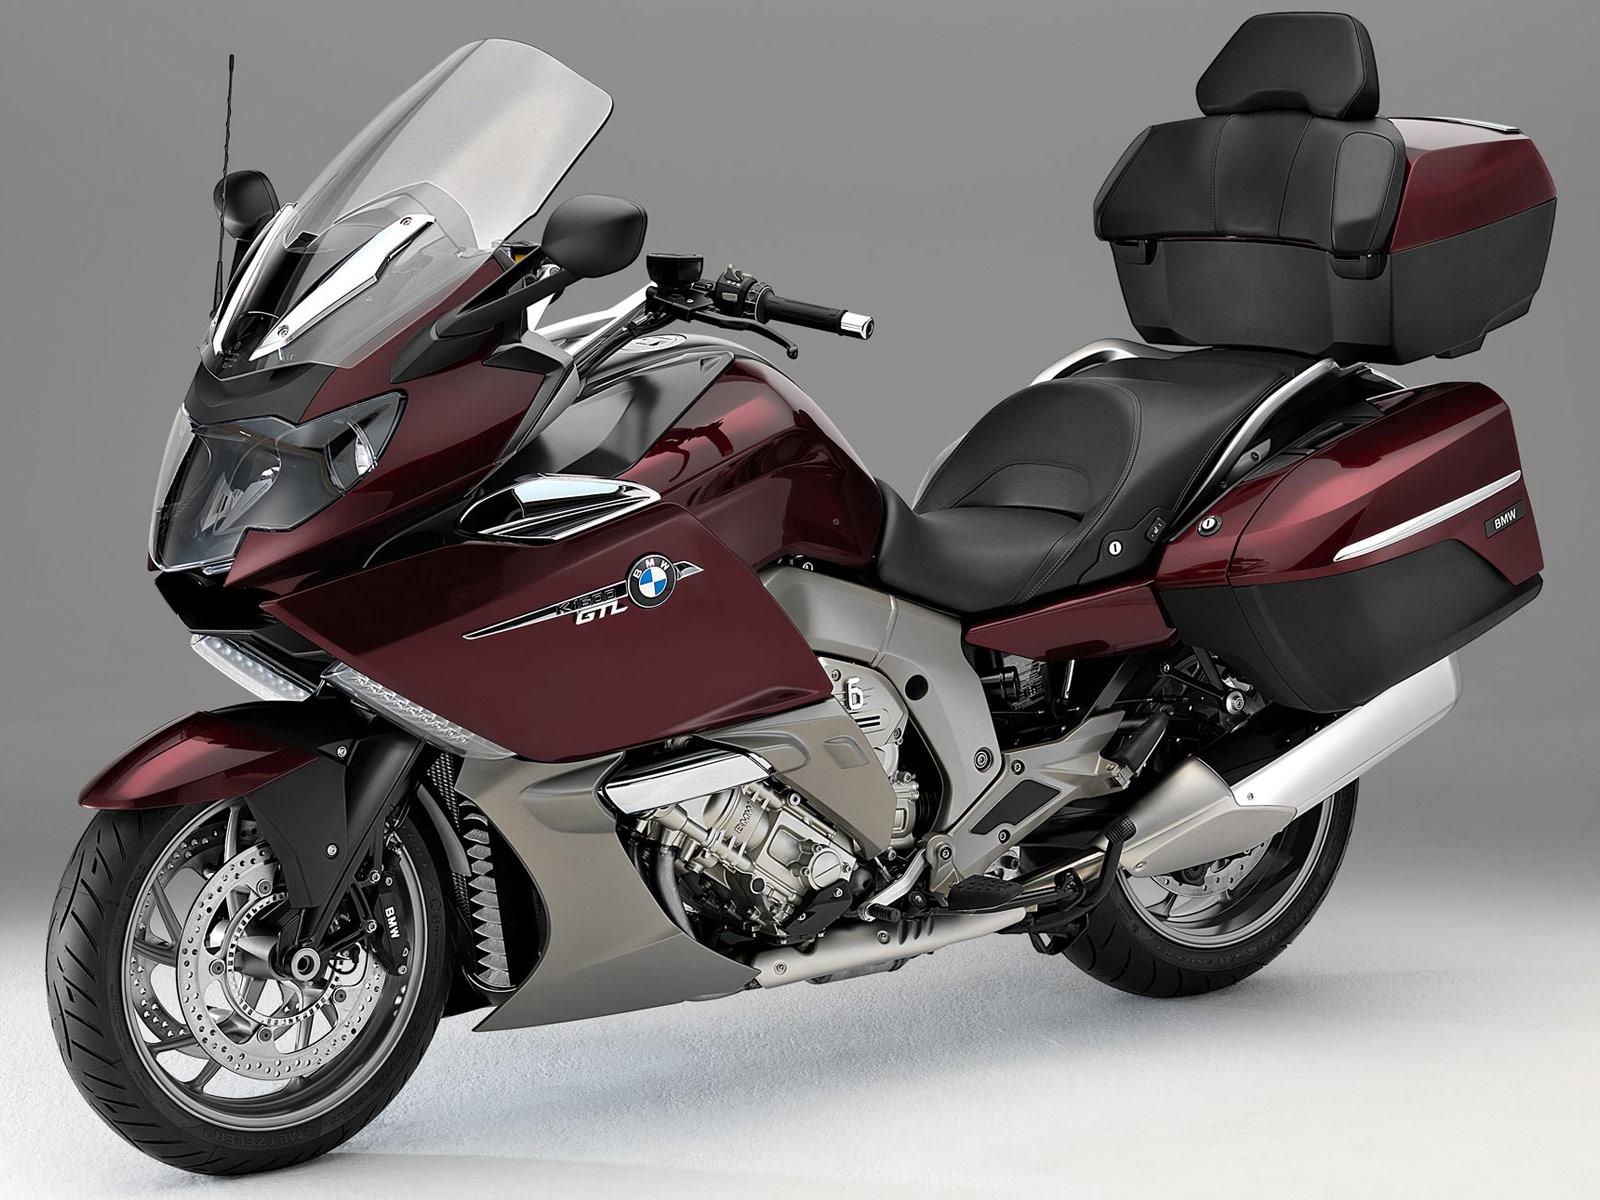 2013 Bmw K1600gtl Motorcycle Insurance Information